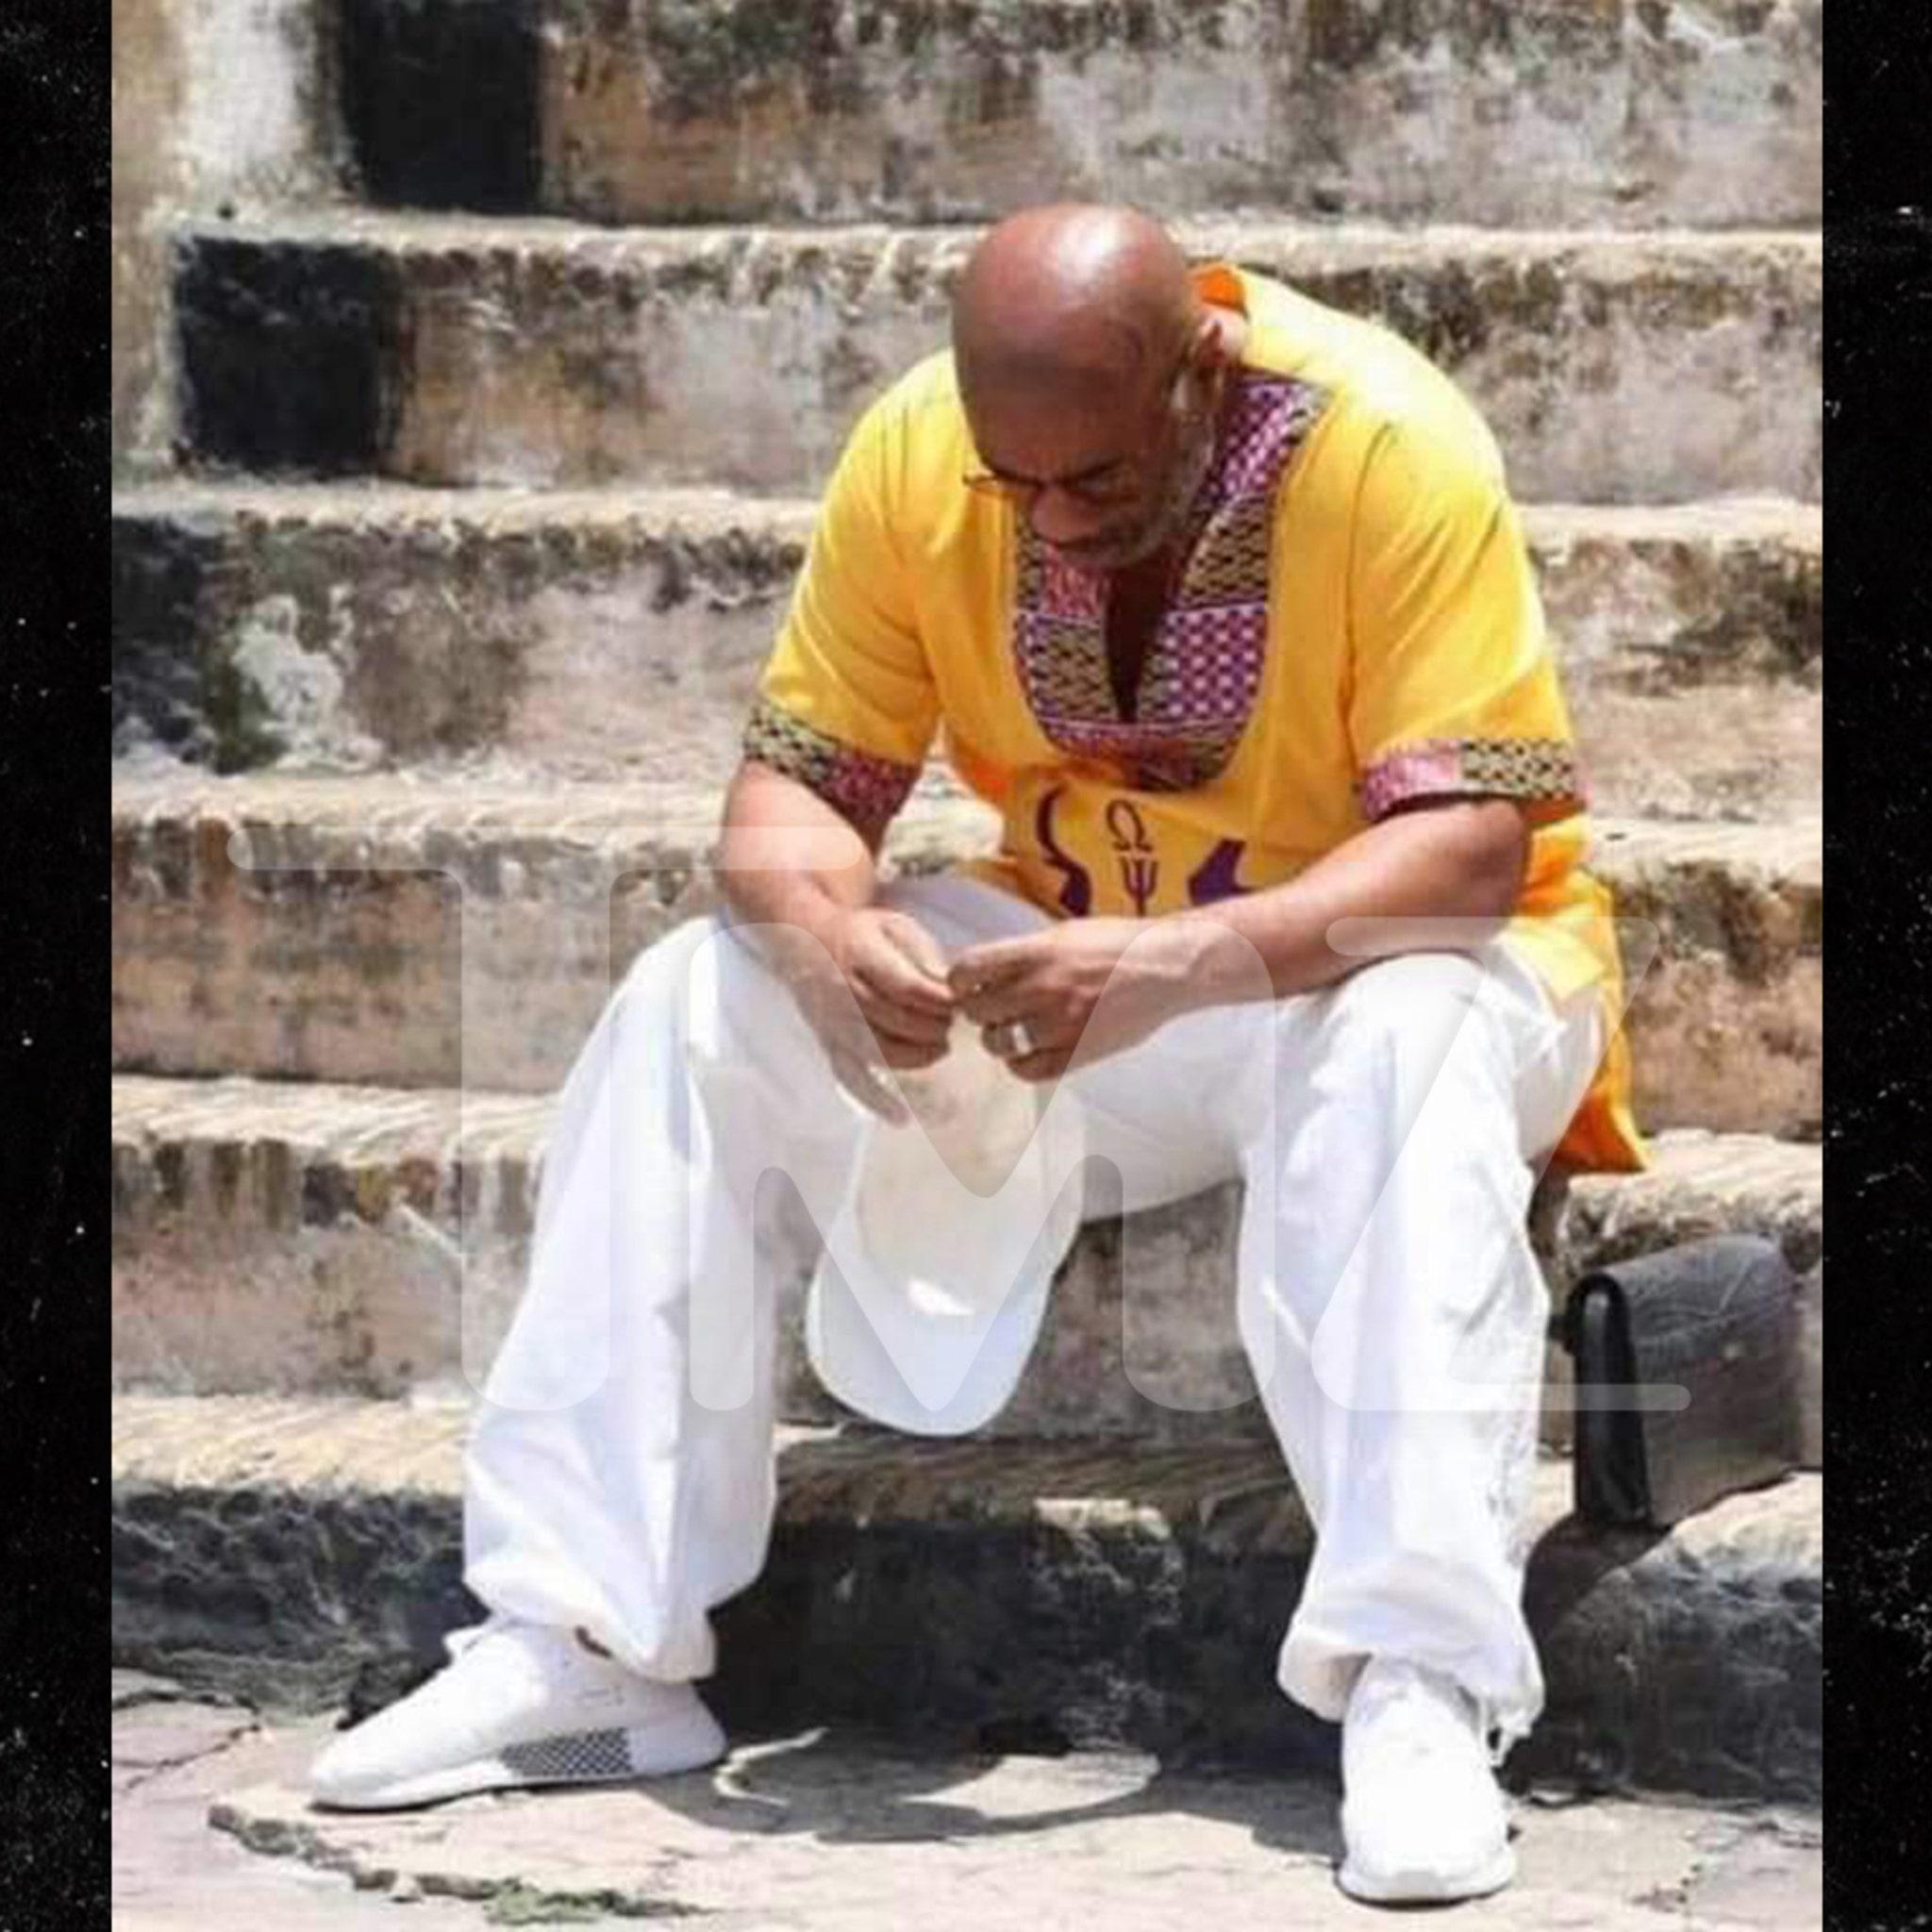 Steve Harvey Breaks Down in Tears Visiting Ghana's Elmina Slave Trade Castle